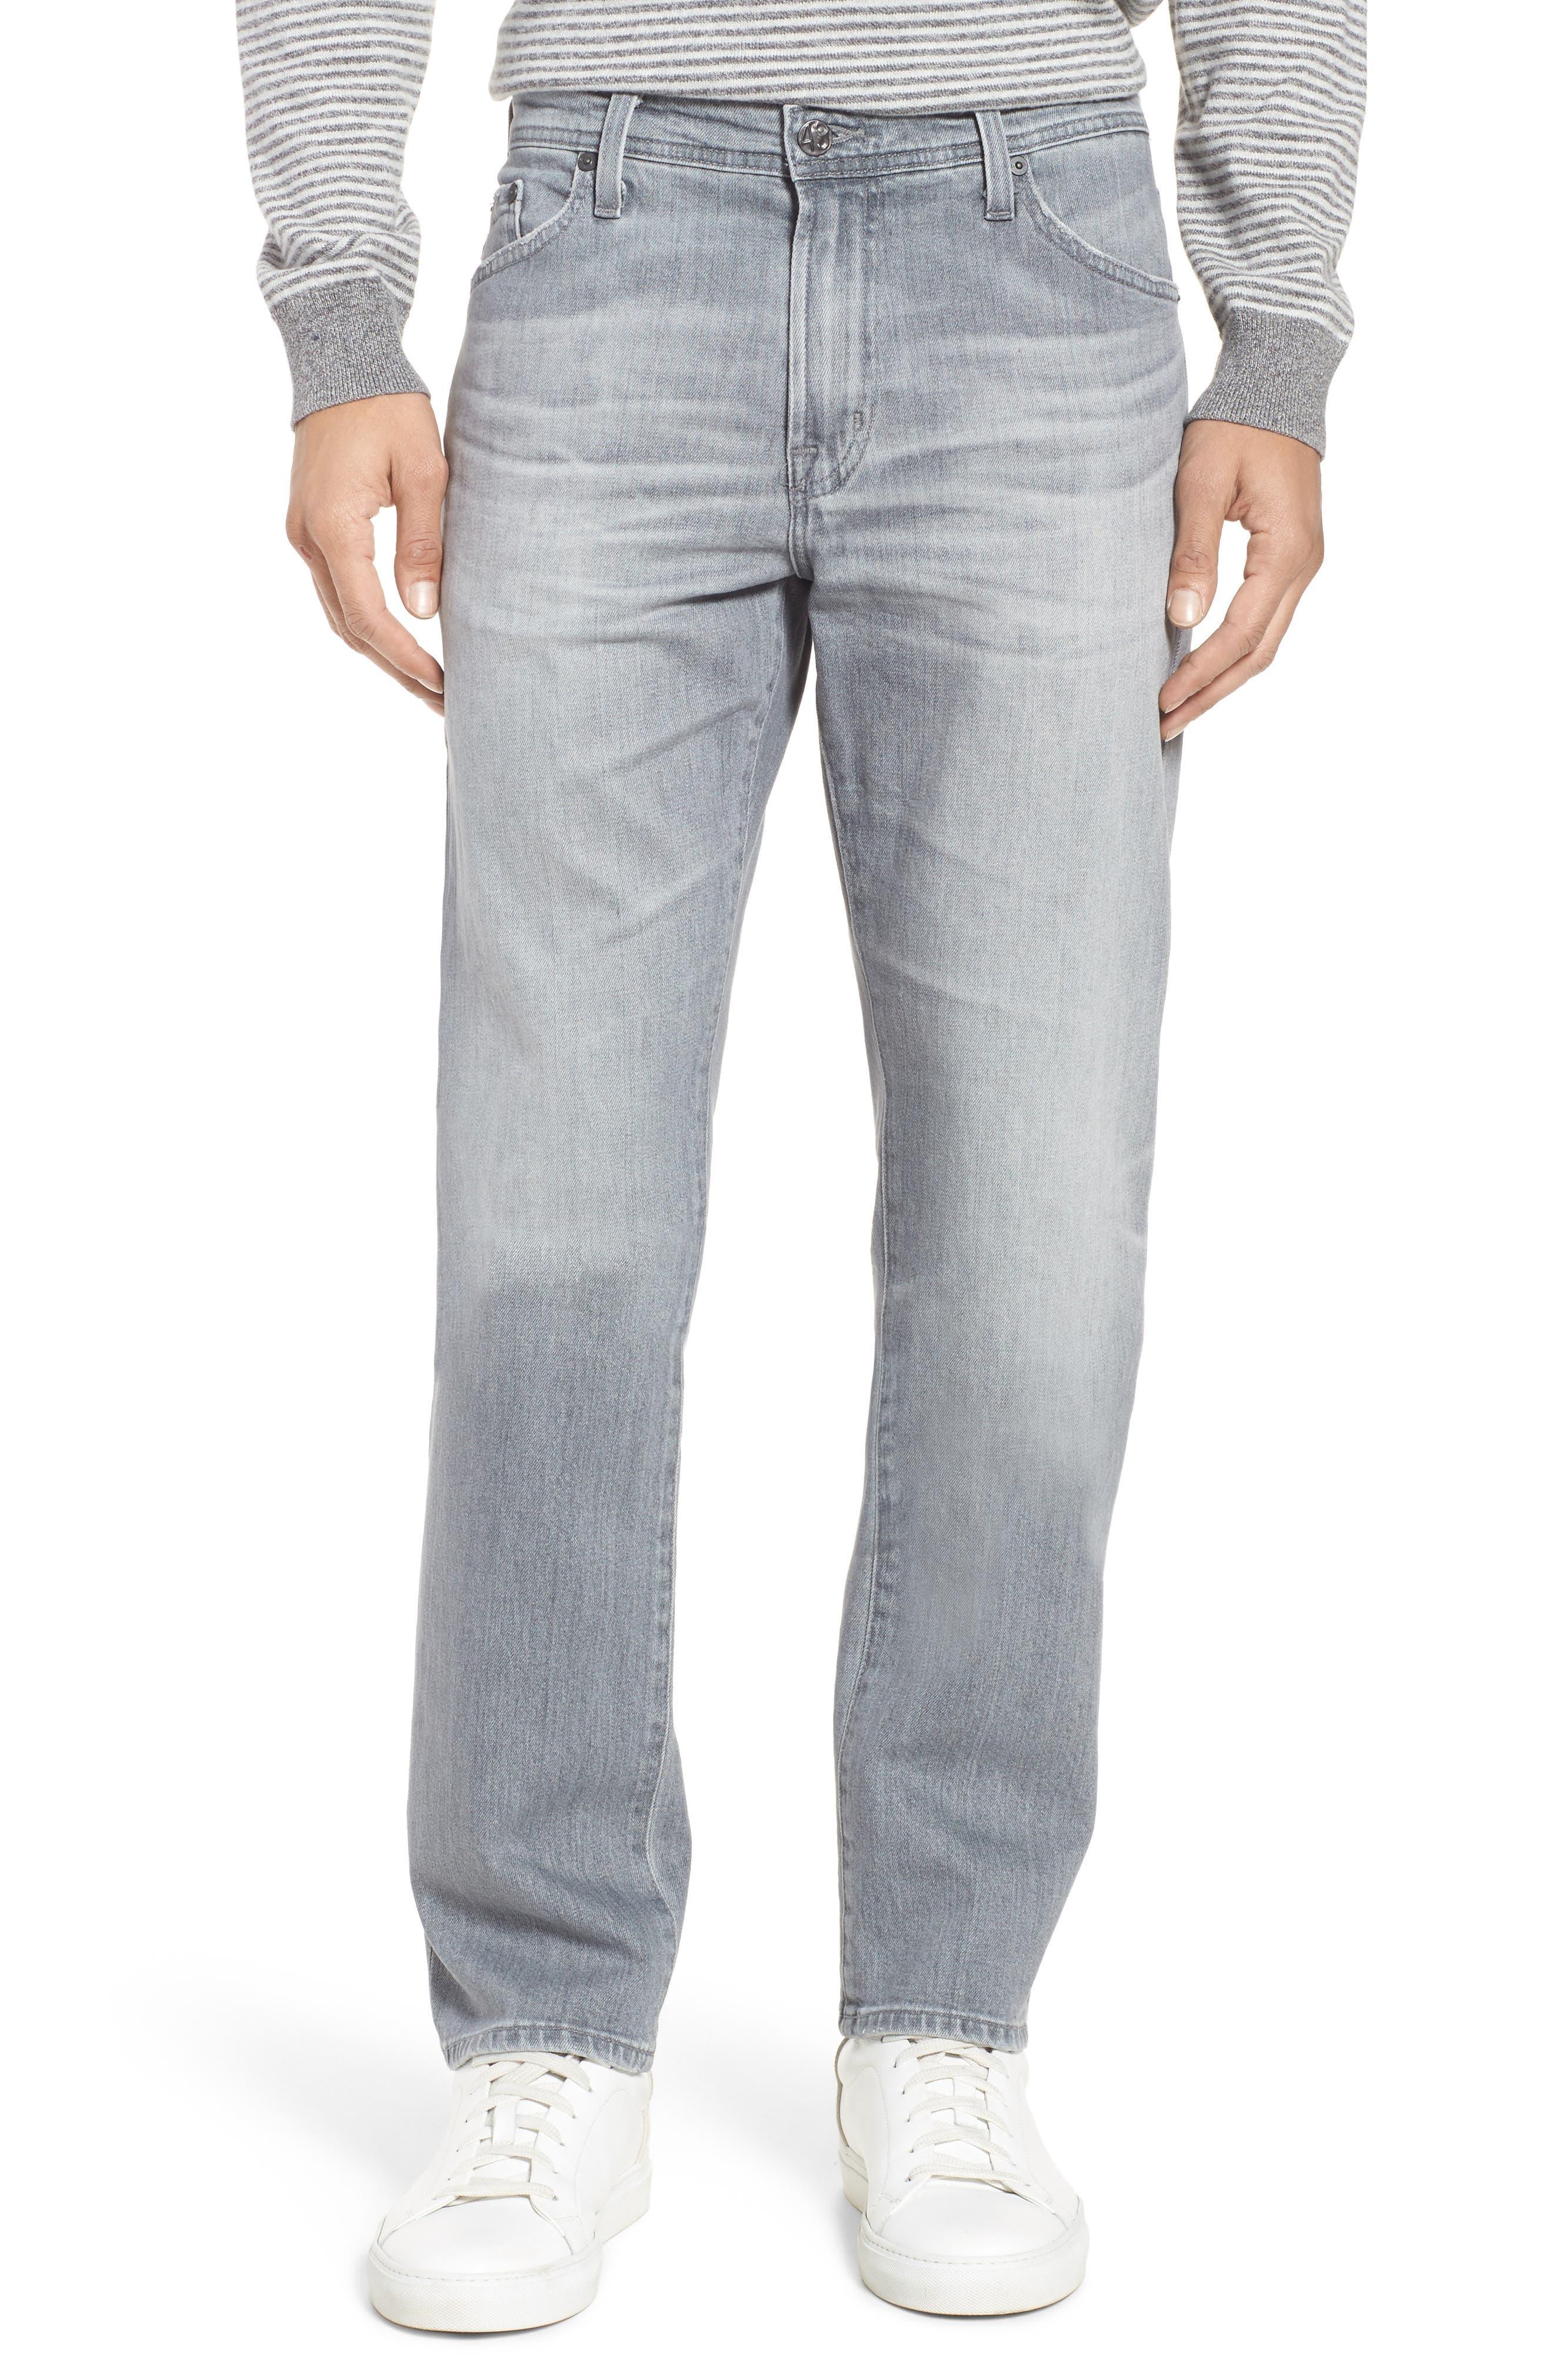 Everett Slim Straight Fit Jeans,                             Main thumbnail 1, color,